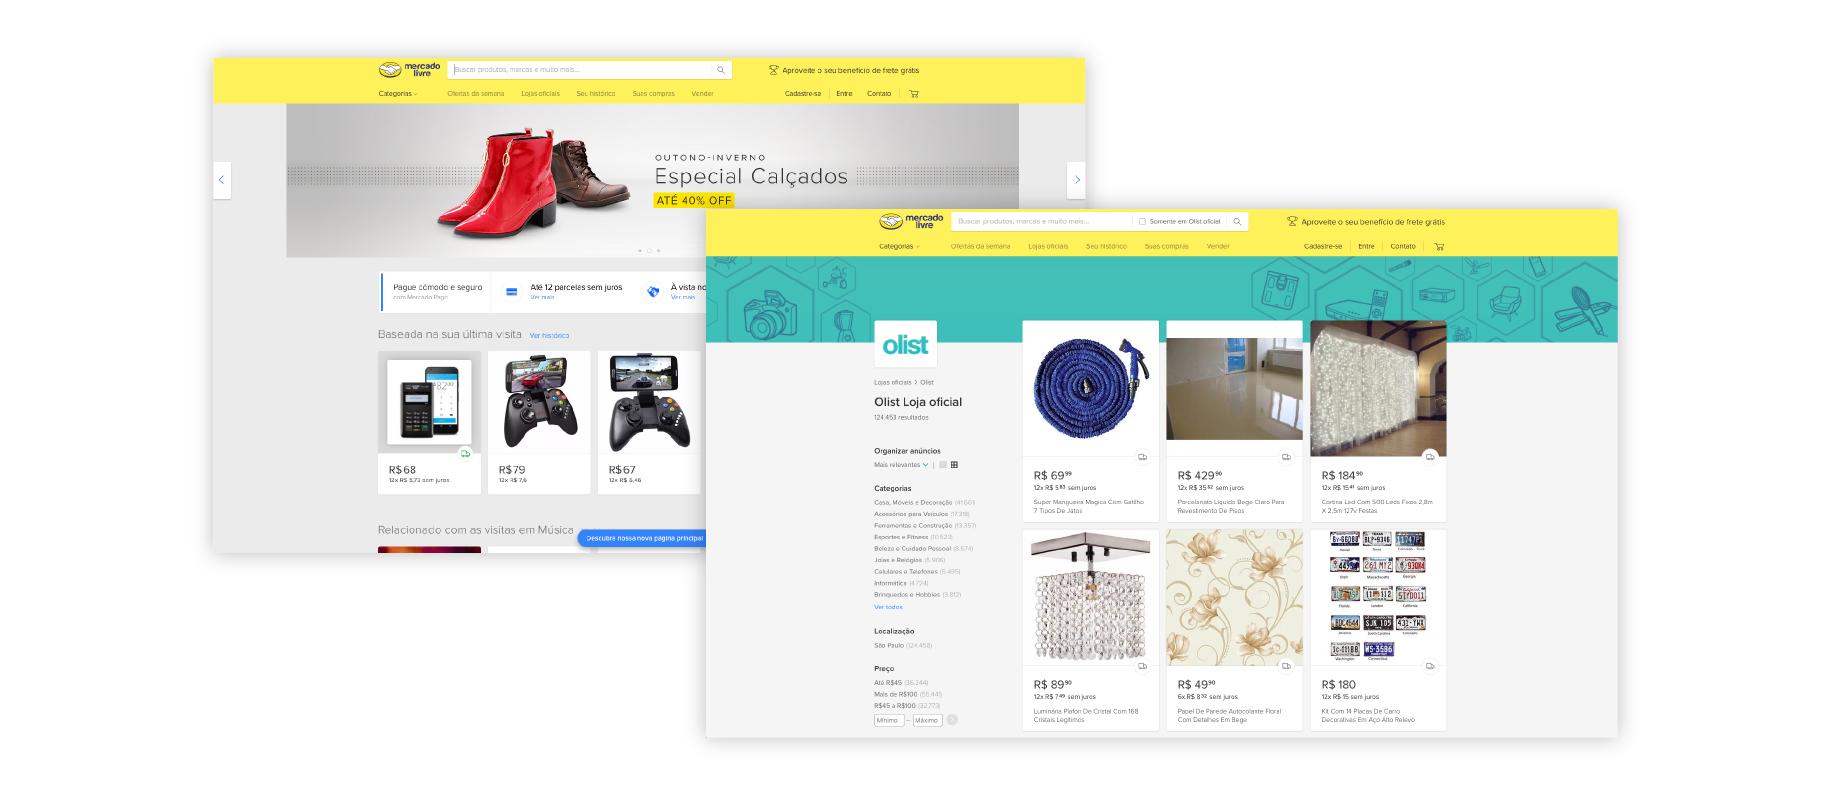 banners-site-marketplaces-meli_Screenshots.png